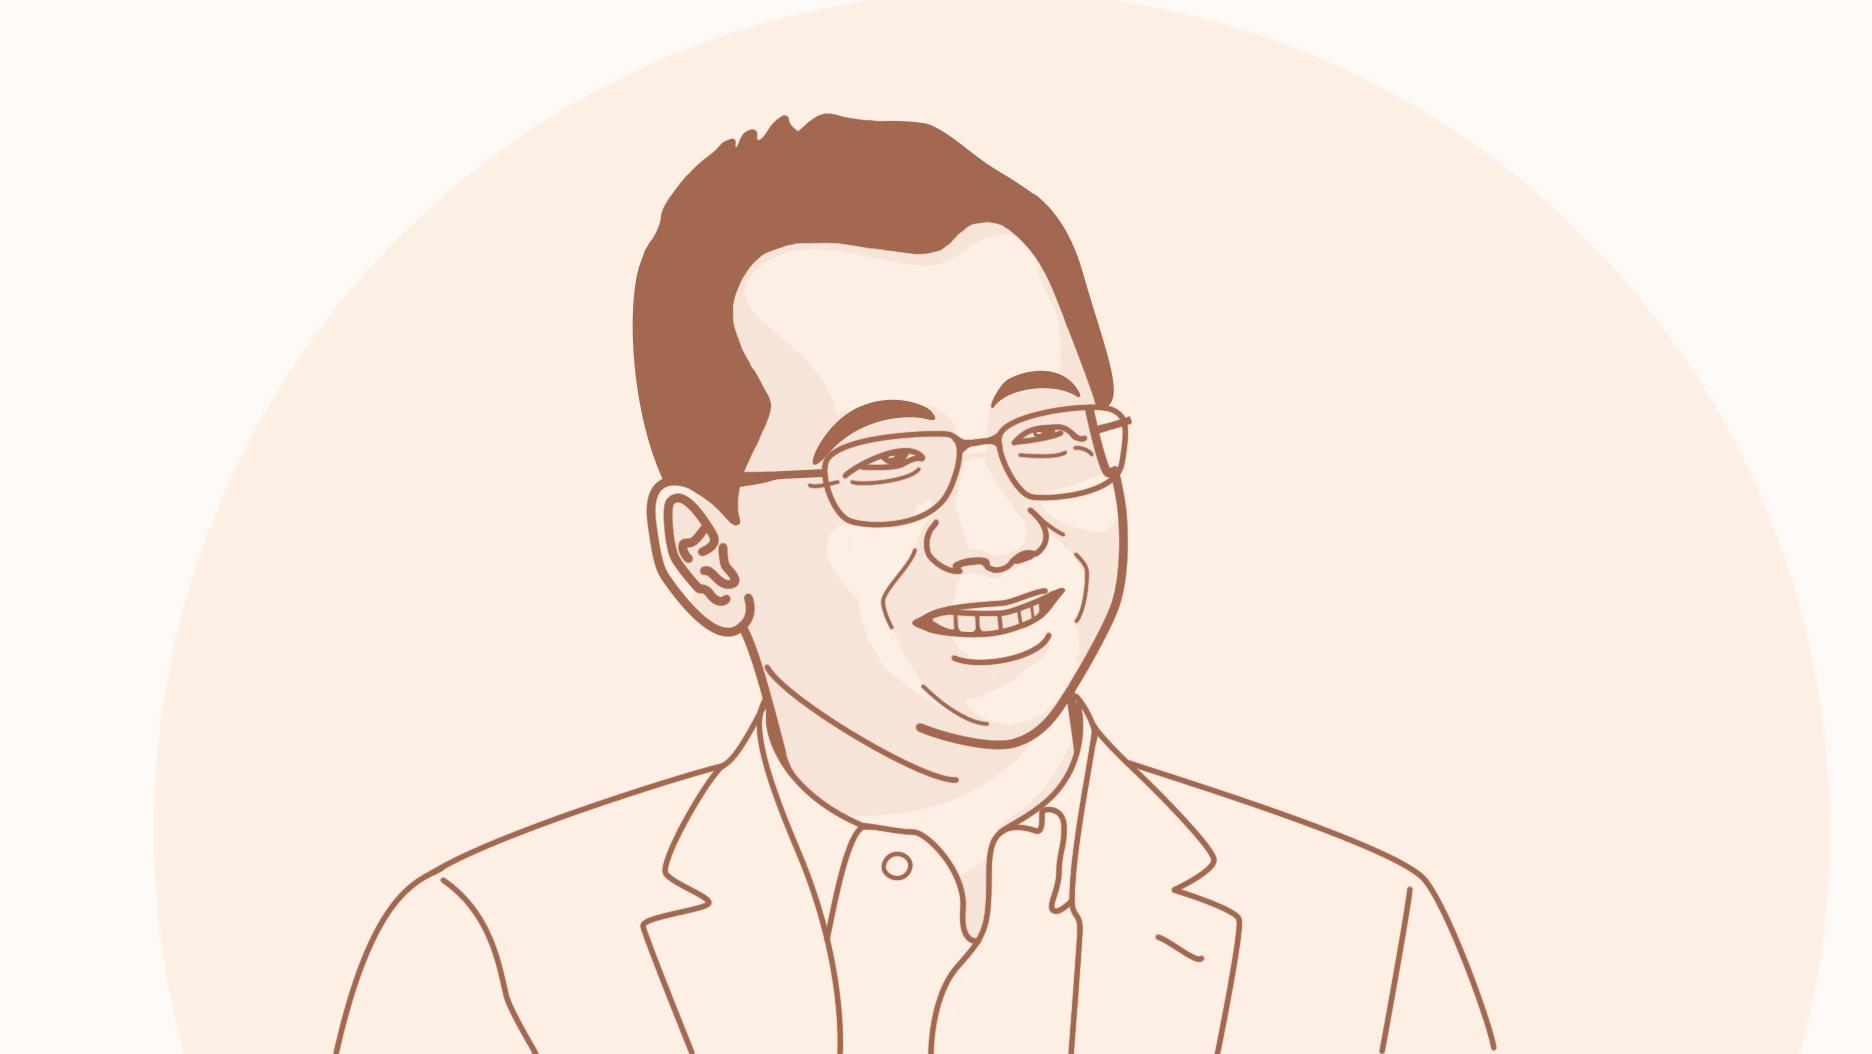 Zhang Yiming: The man who said no to Baidu, Alibaba and Tencent